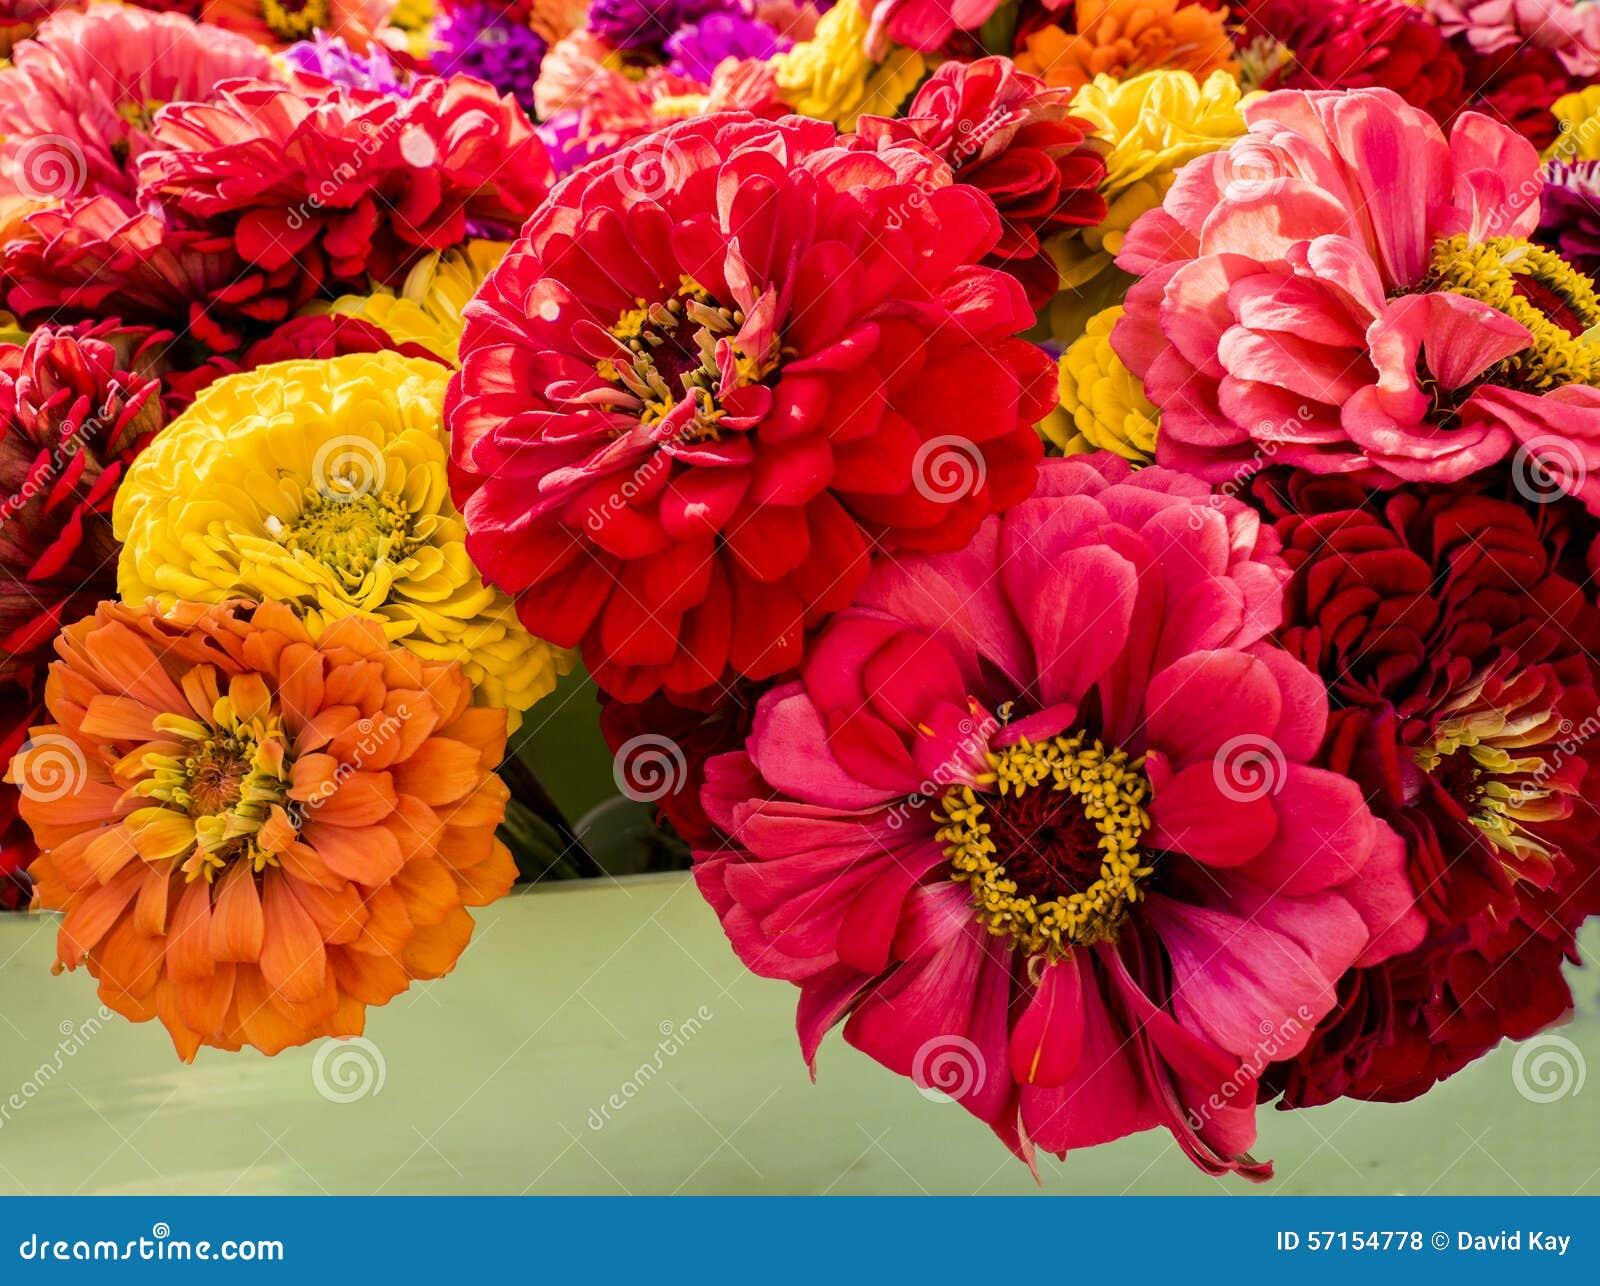 Zinnia flower bouquet stock photo. Image of sale, farm - 57154778